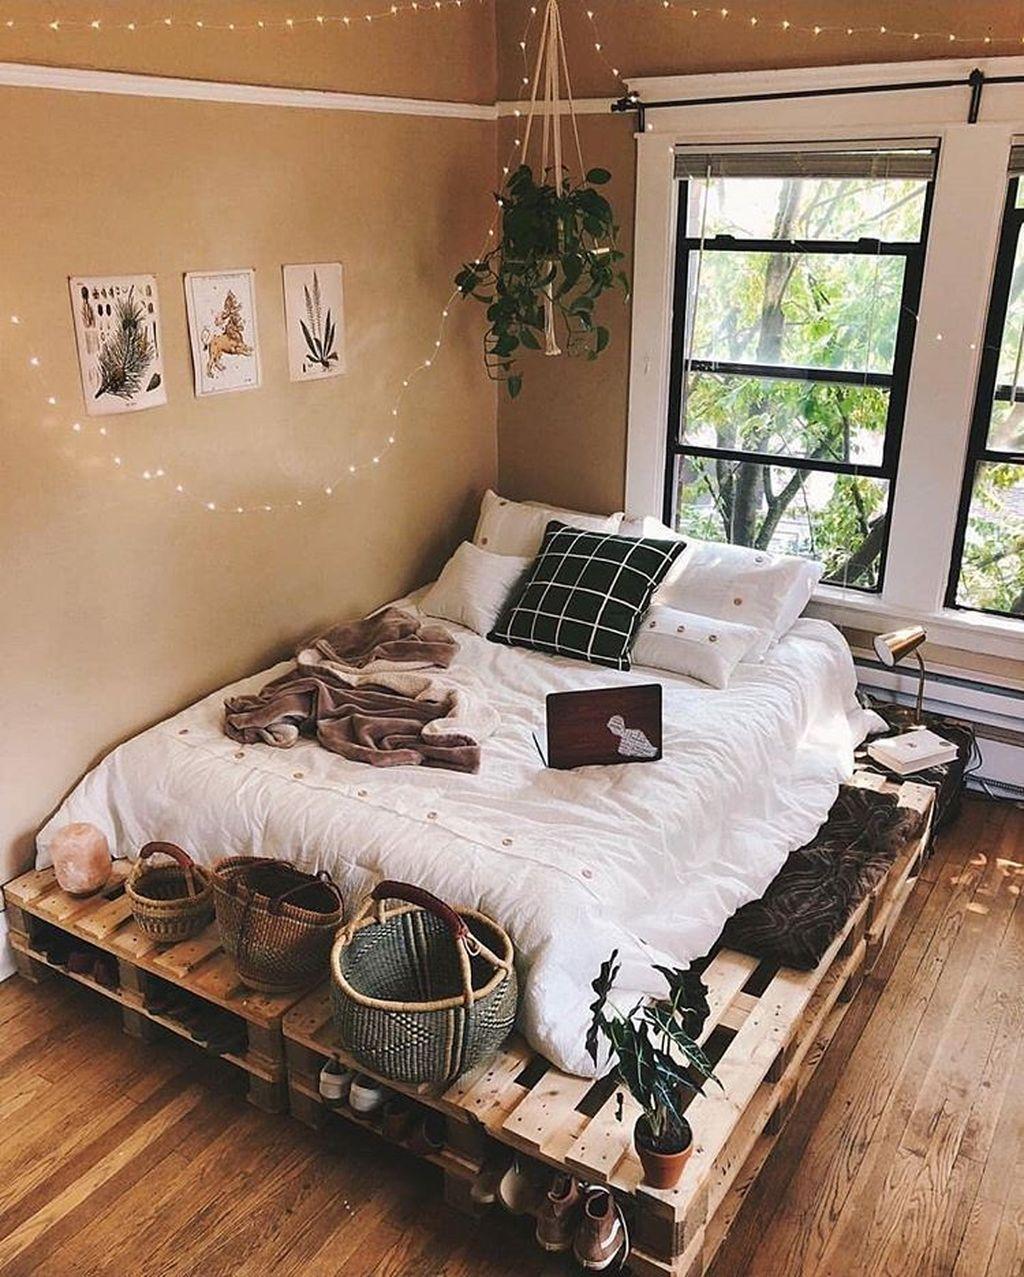 Stunning Bedding Ideas For Cozy Bedroom 04